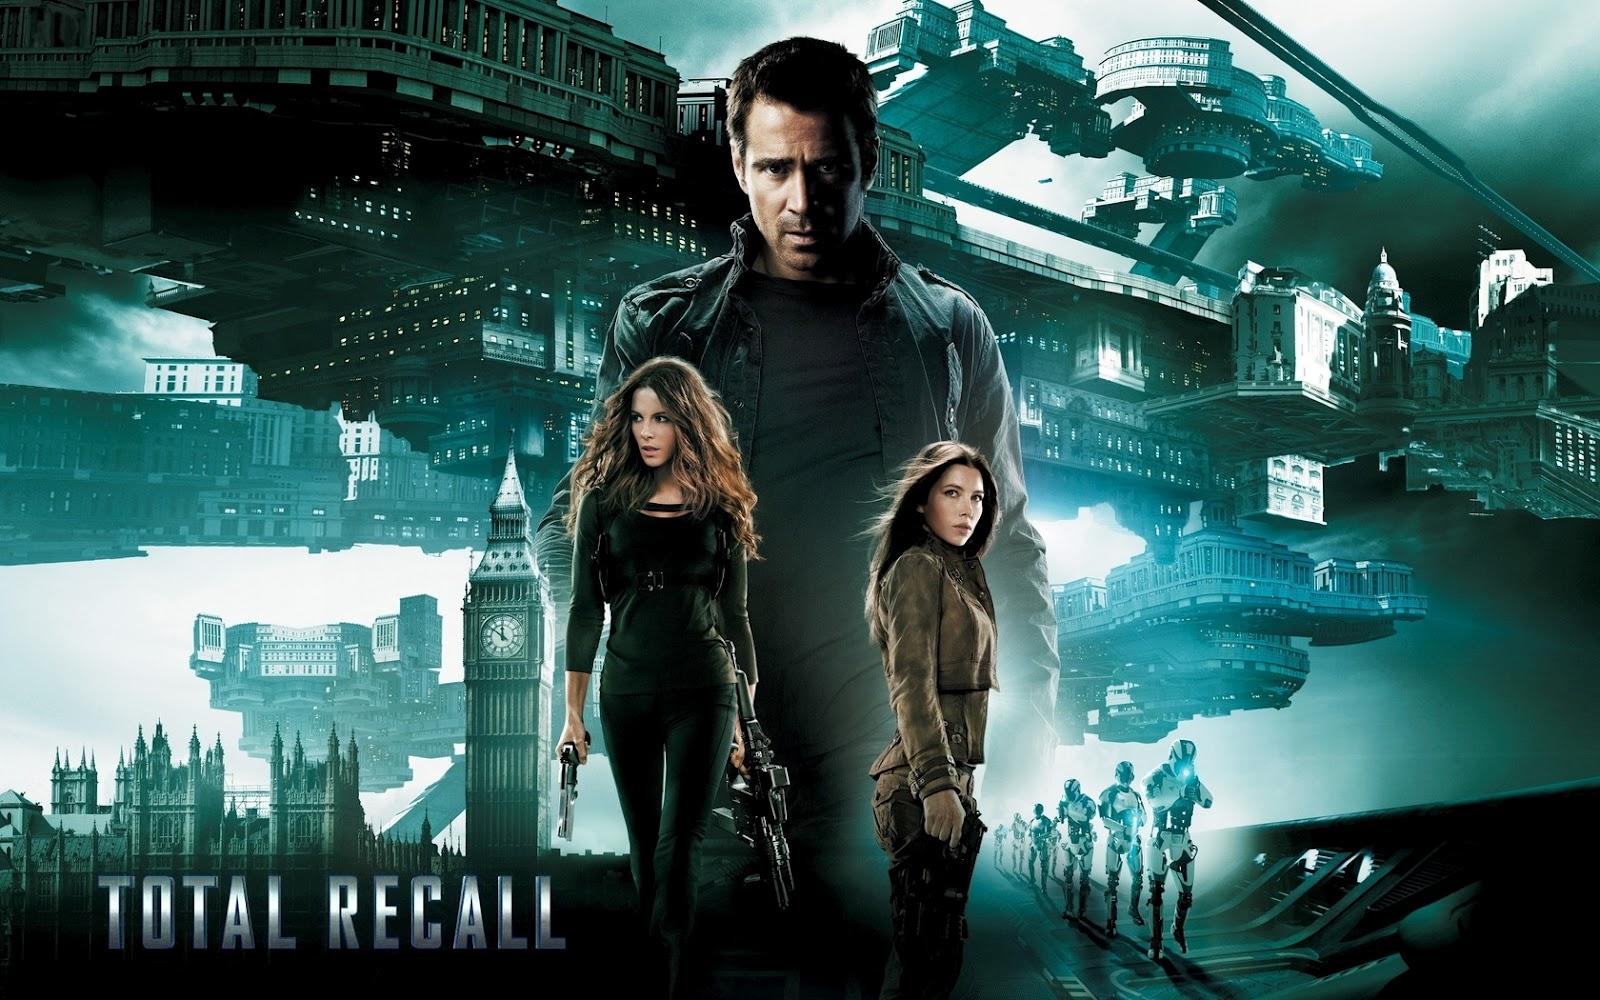 http://3.bp.blogspot.com/-6P-42P3pOZQ/UCs7HclKhBI/AAAAAAAAB6M/fVX8JQH6g7Q/s1600/Total_Recall_Movie_Wallpaper_1680x1050.jpg